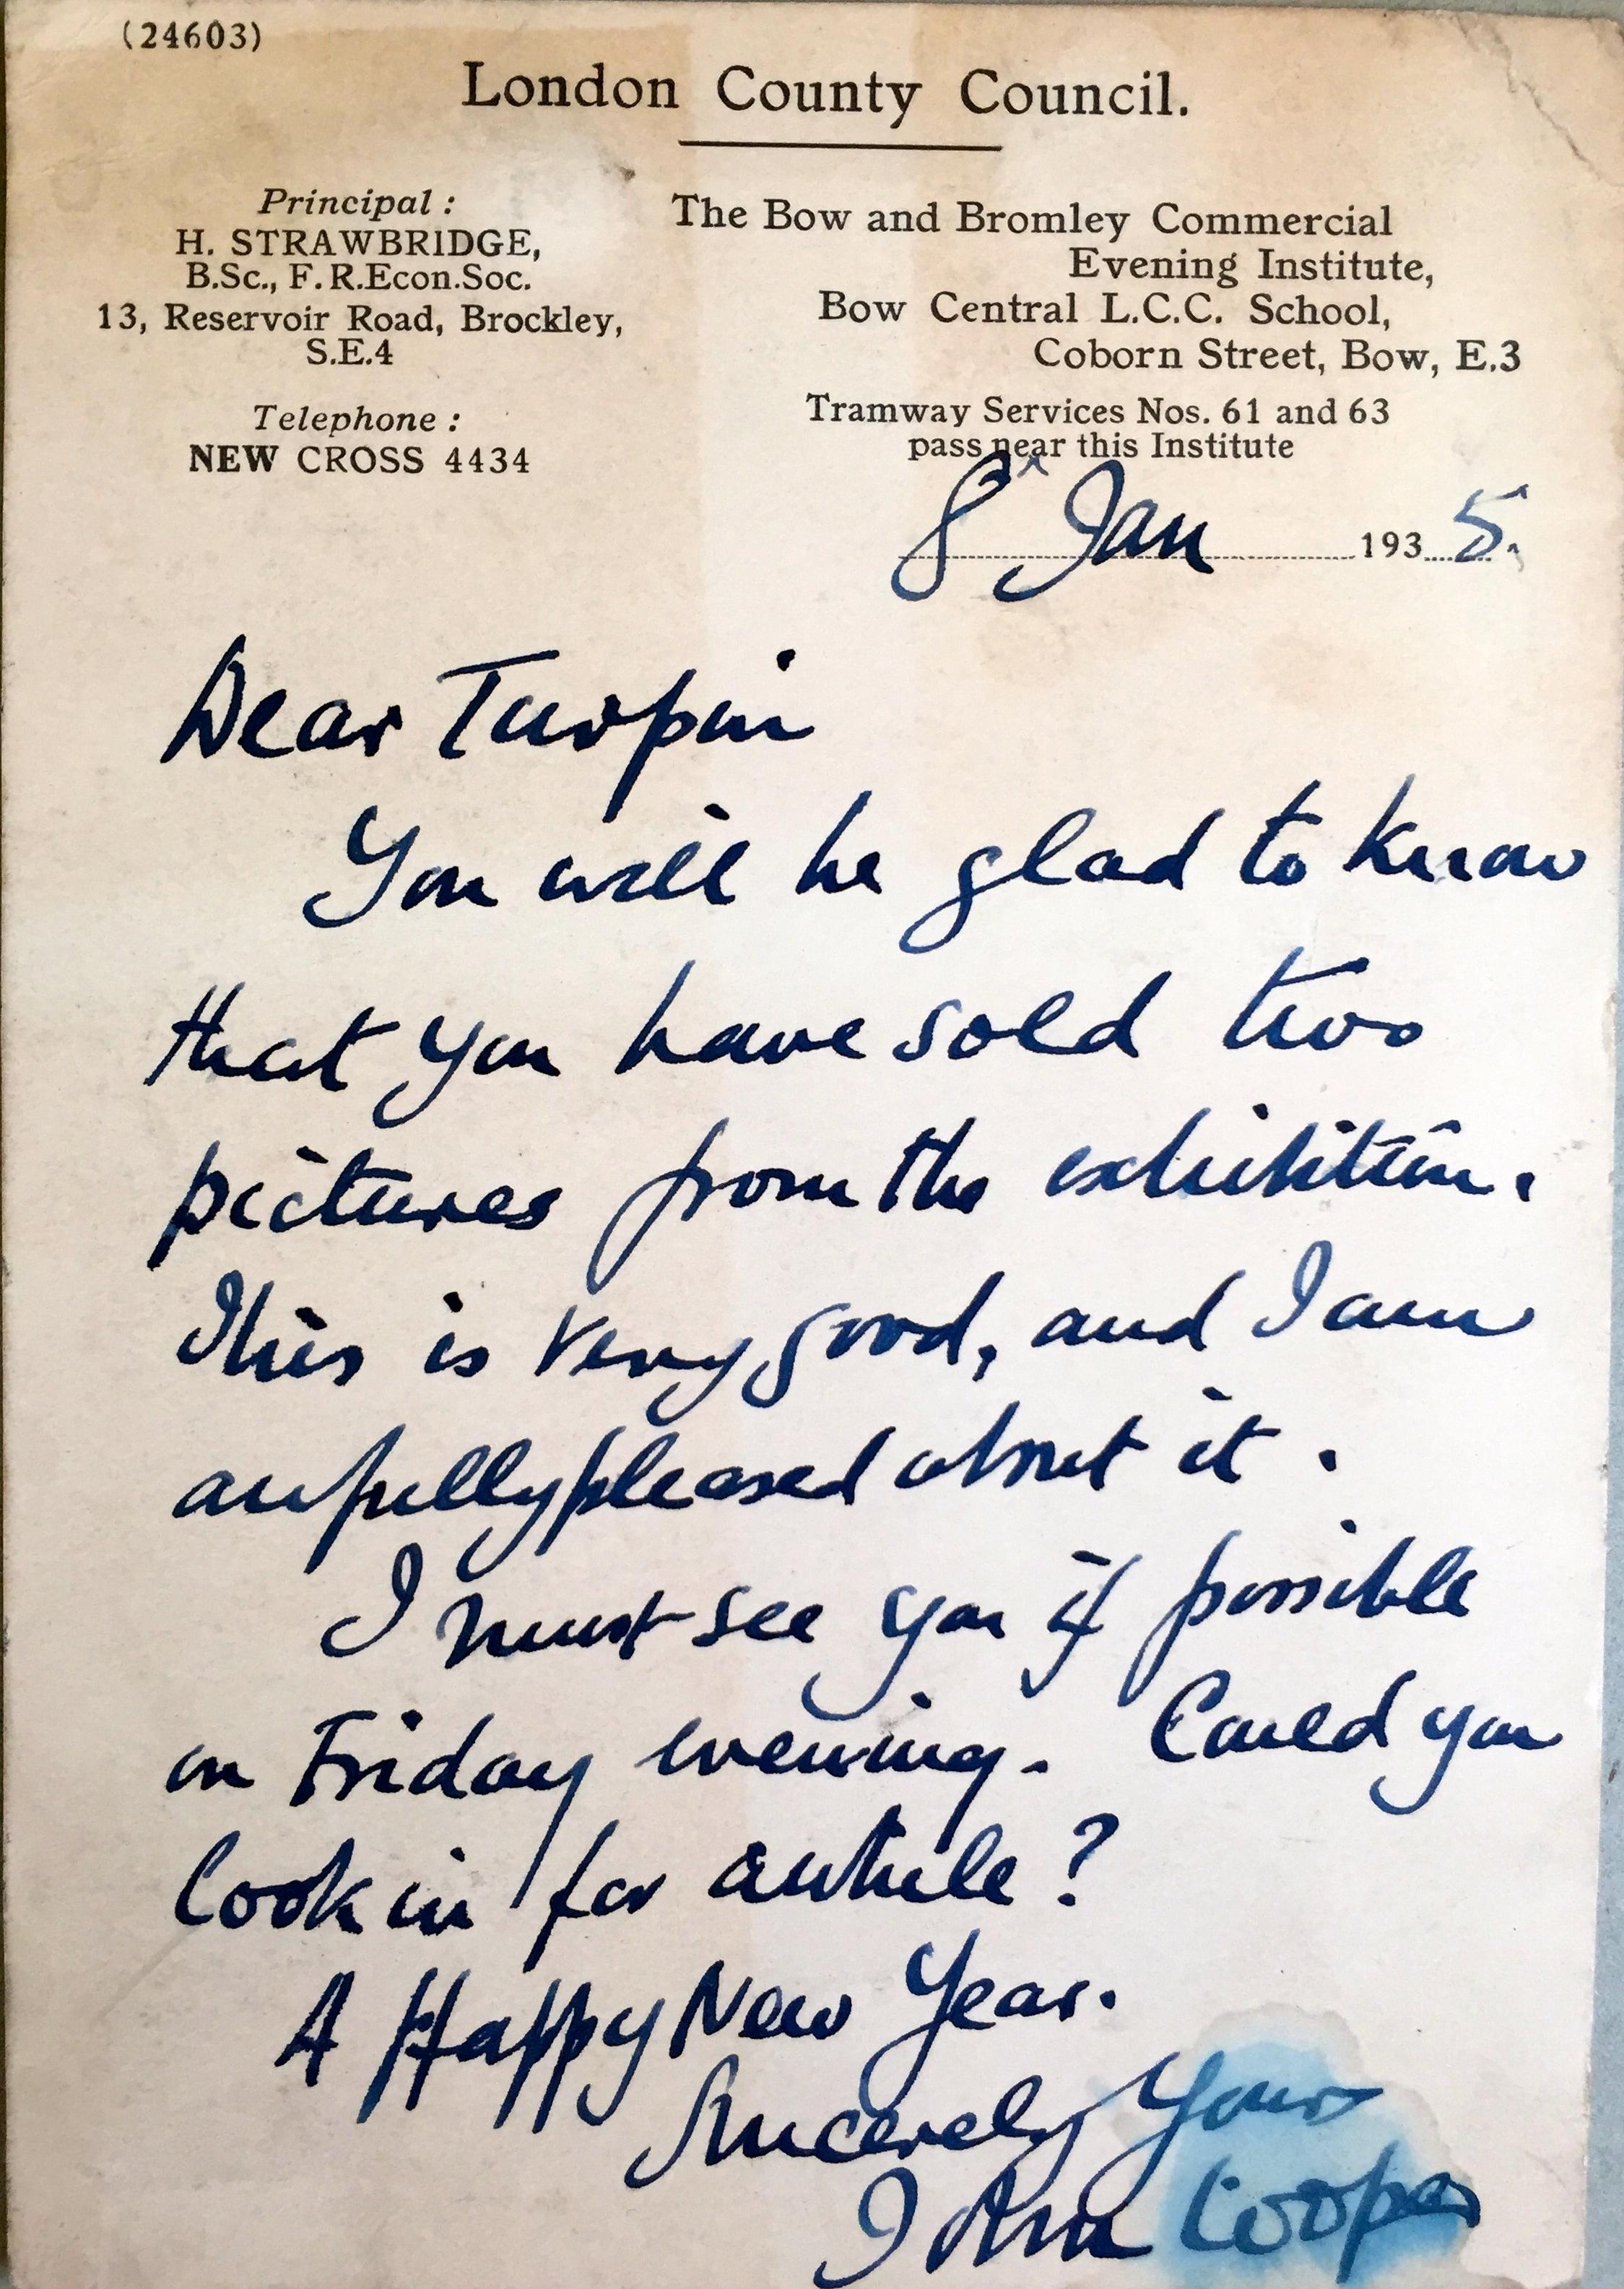 Postcard from John Cooper, 1935